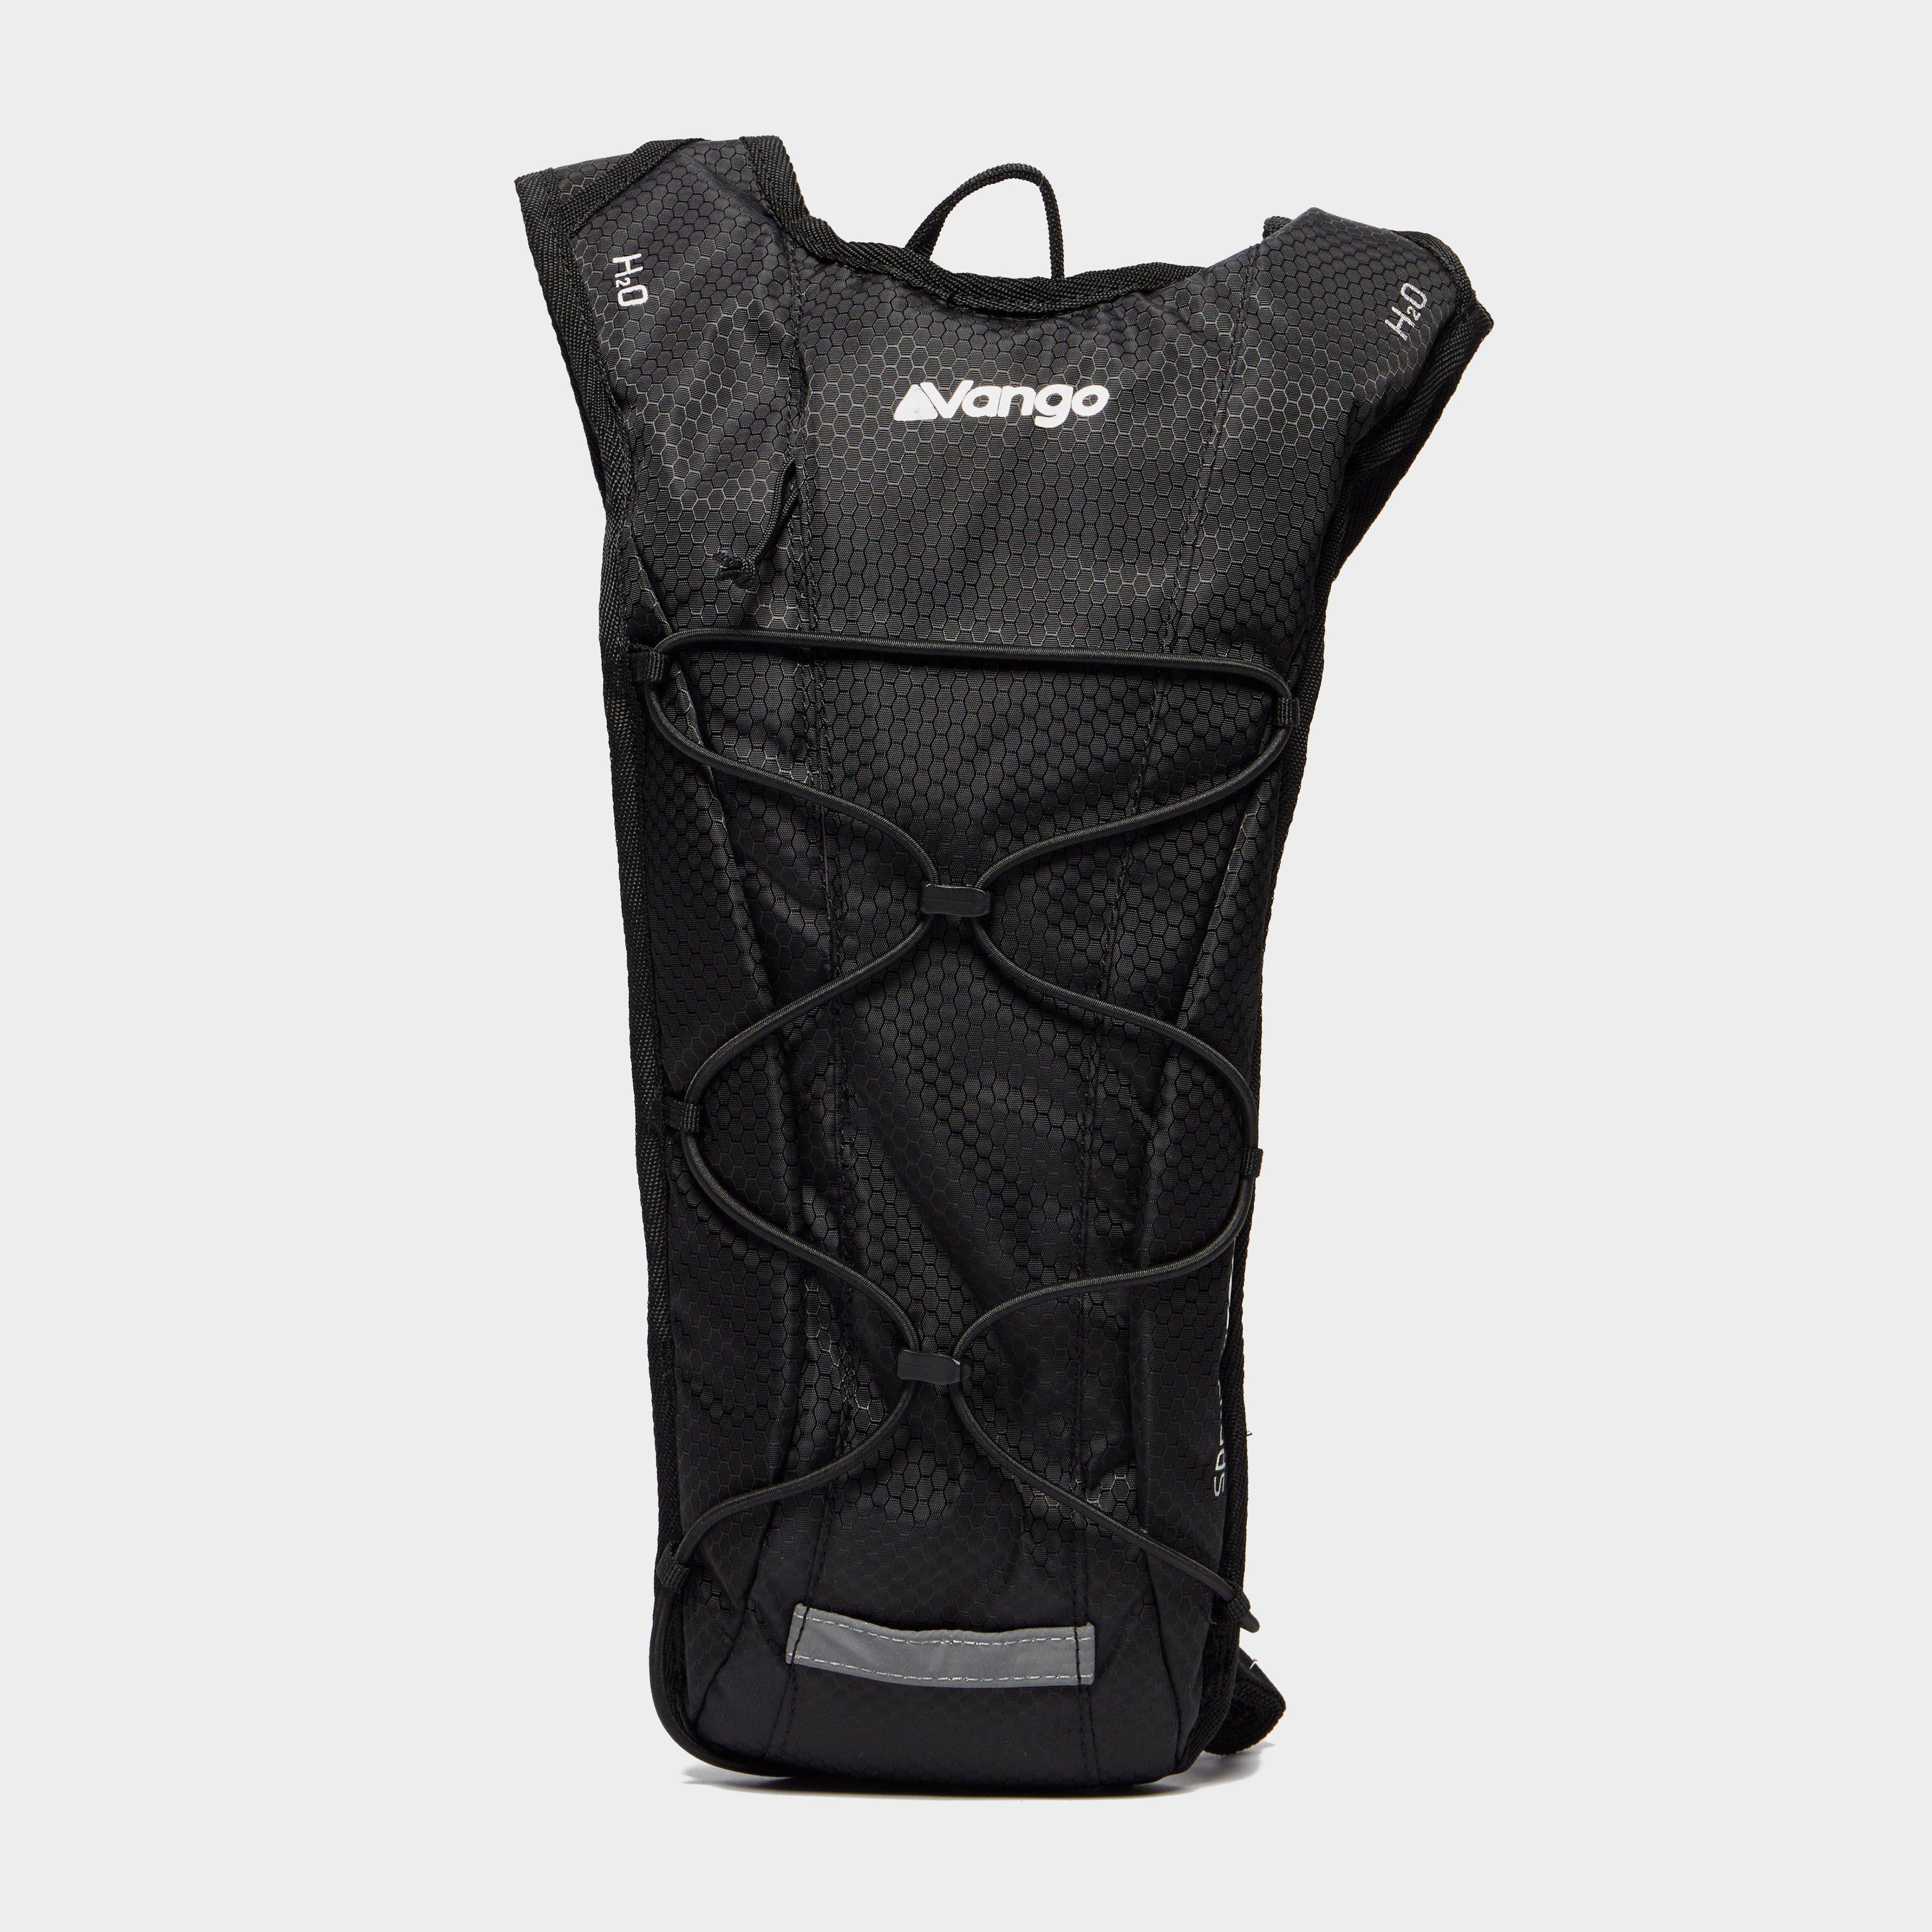 Vango Vango Sprint 3 Hydration Pack - Black, Black